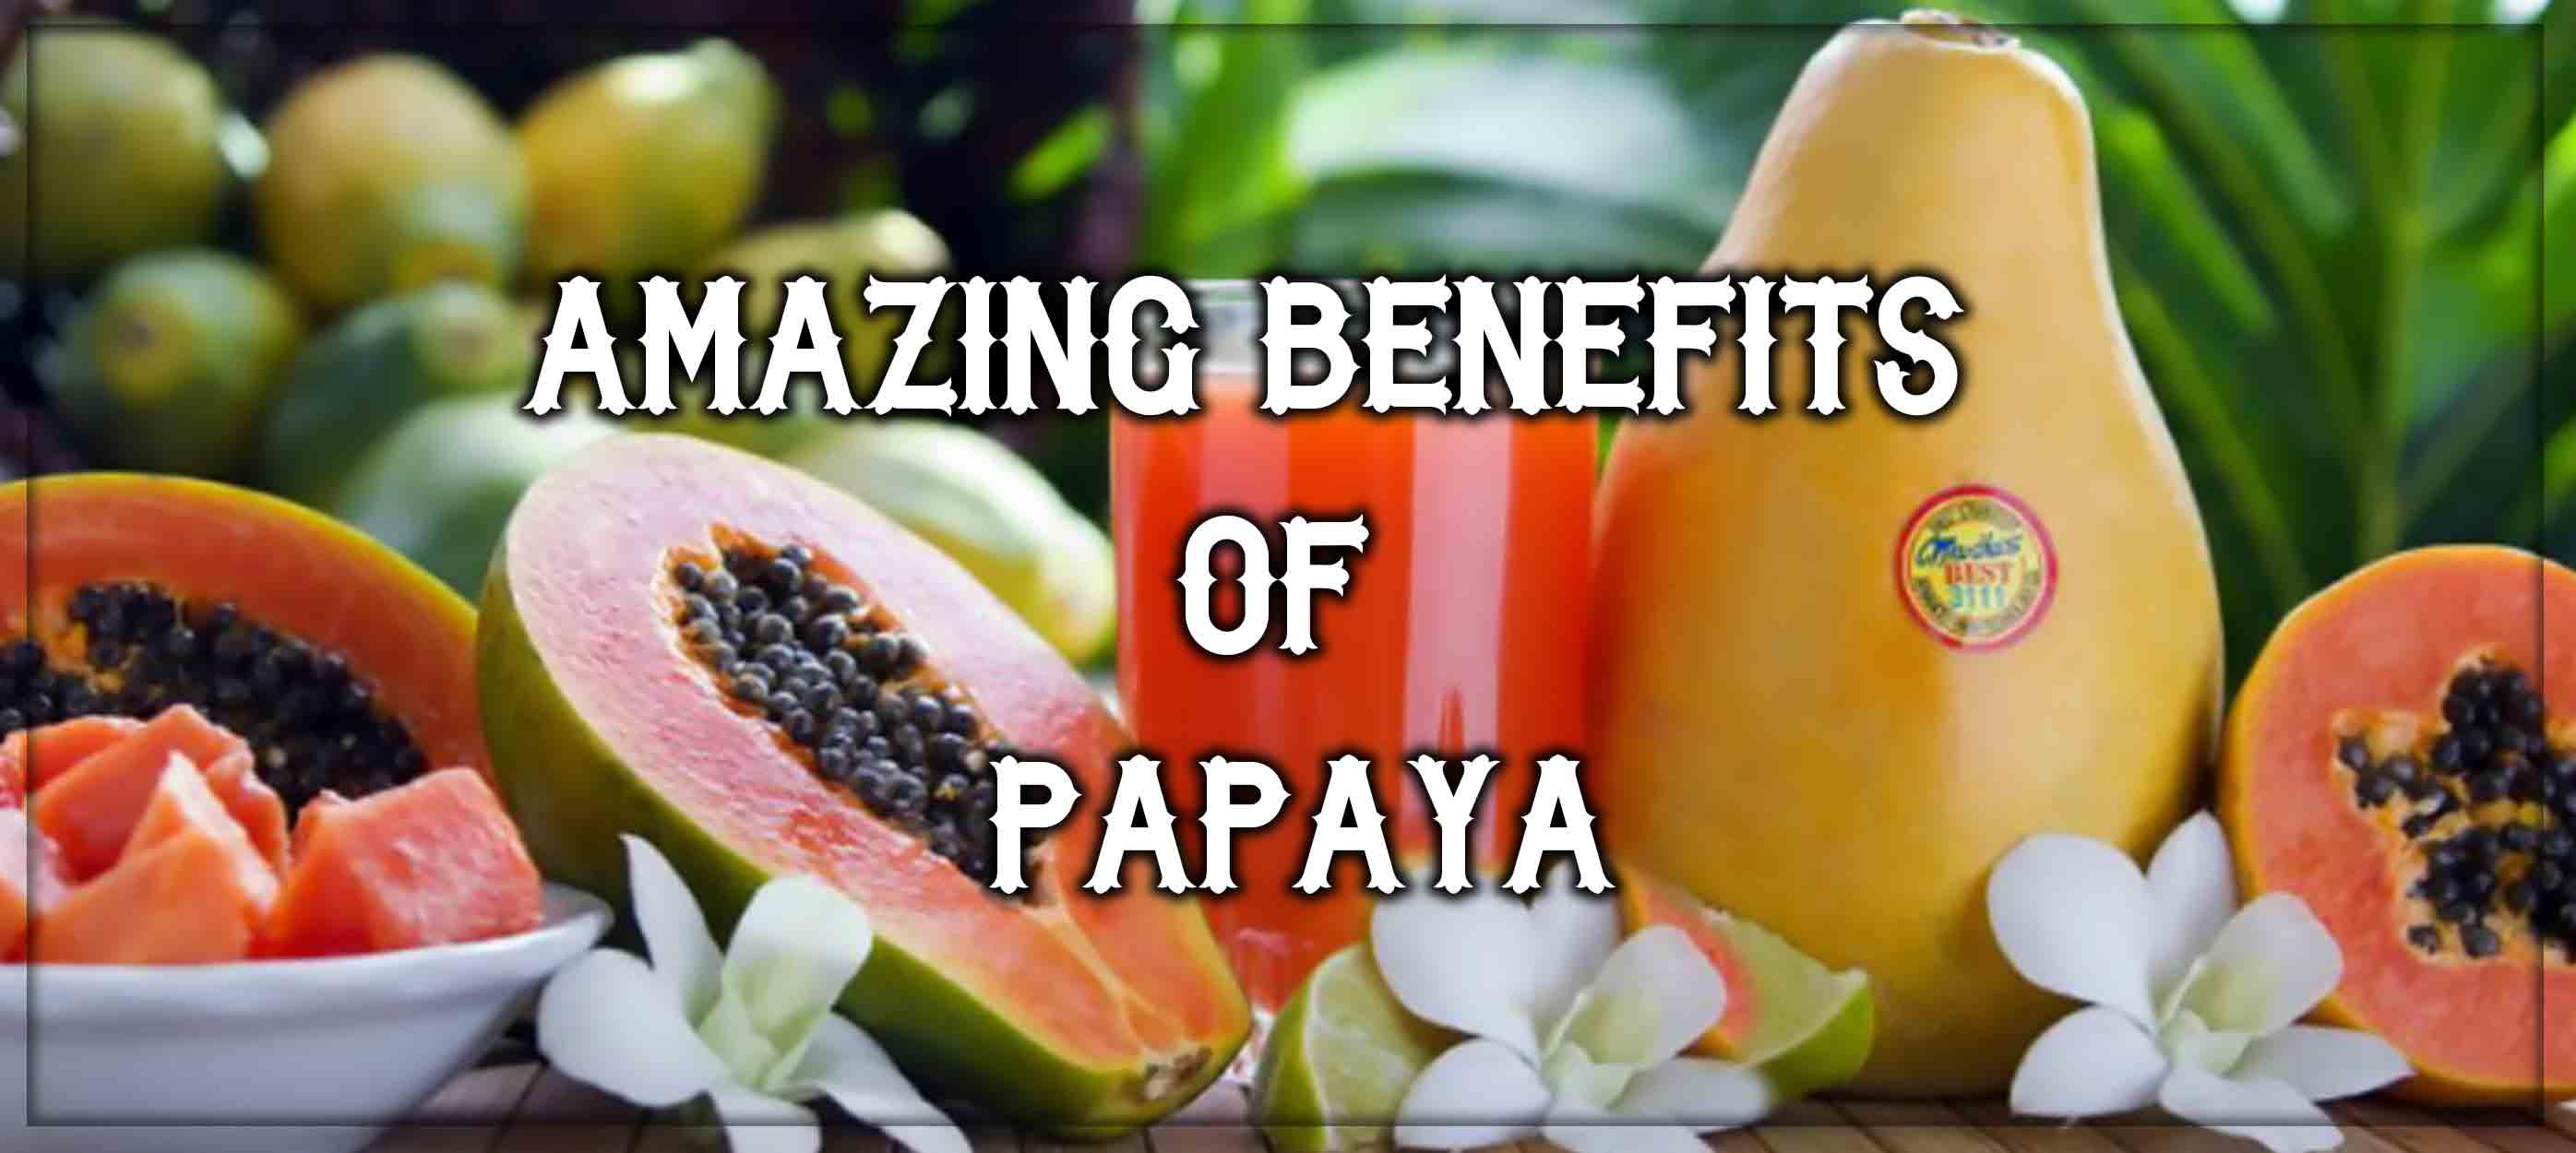 Amazing Benefits of Papaya